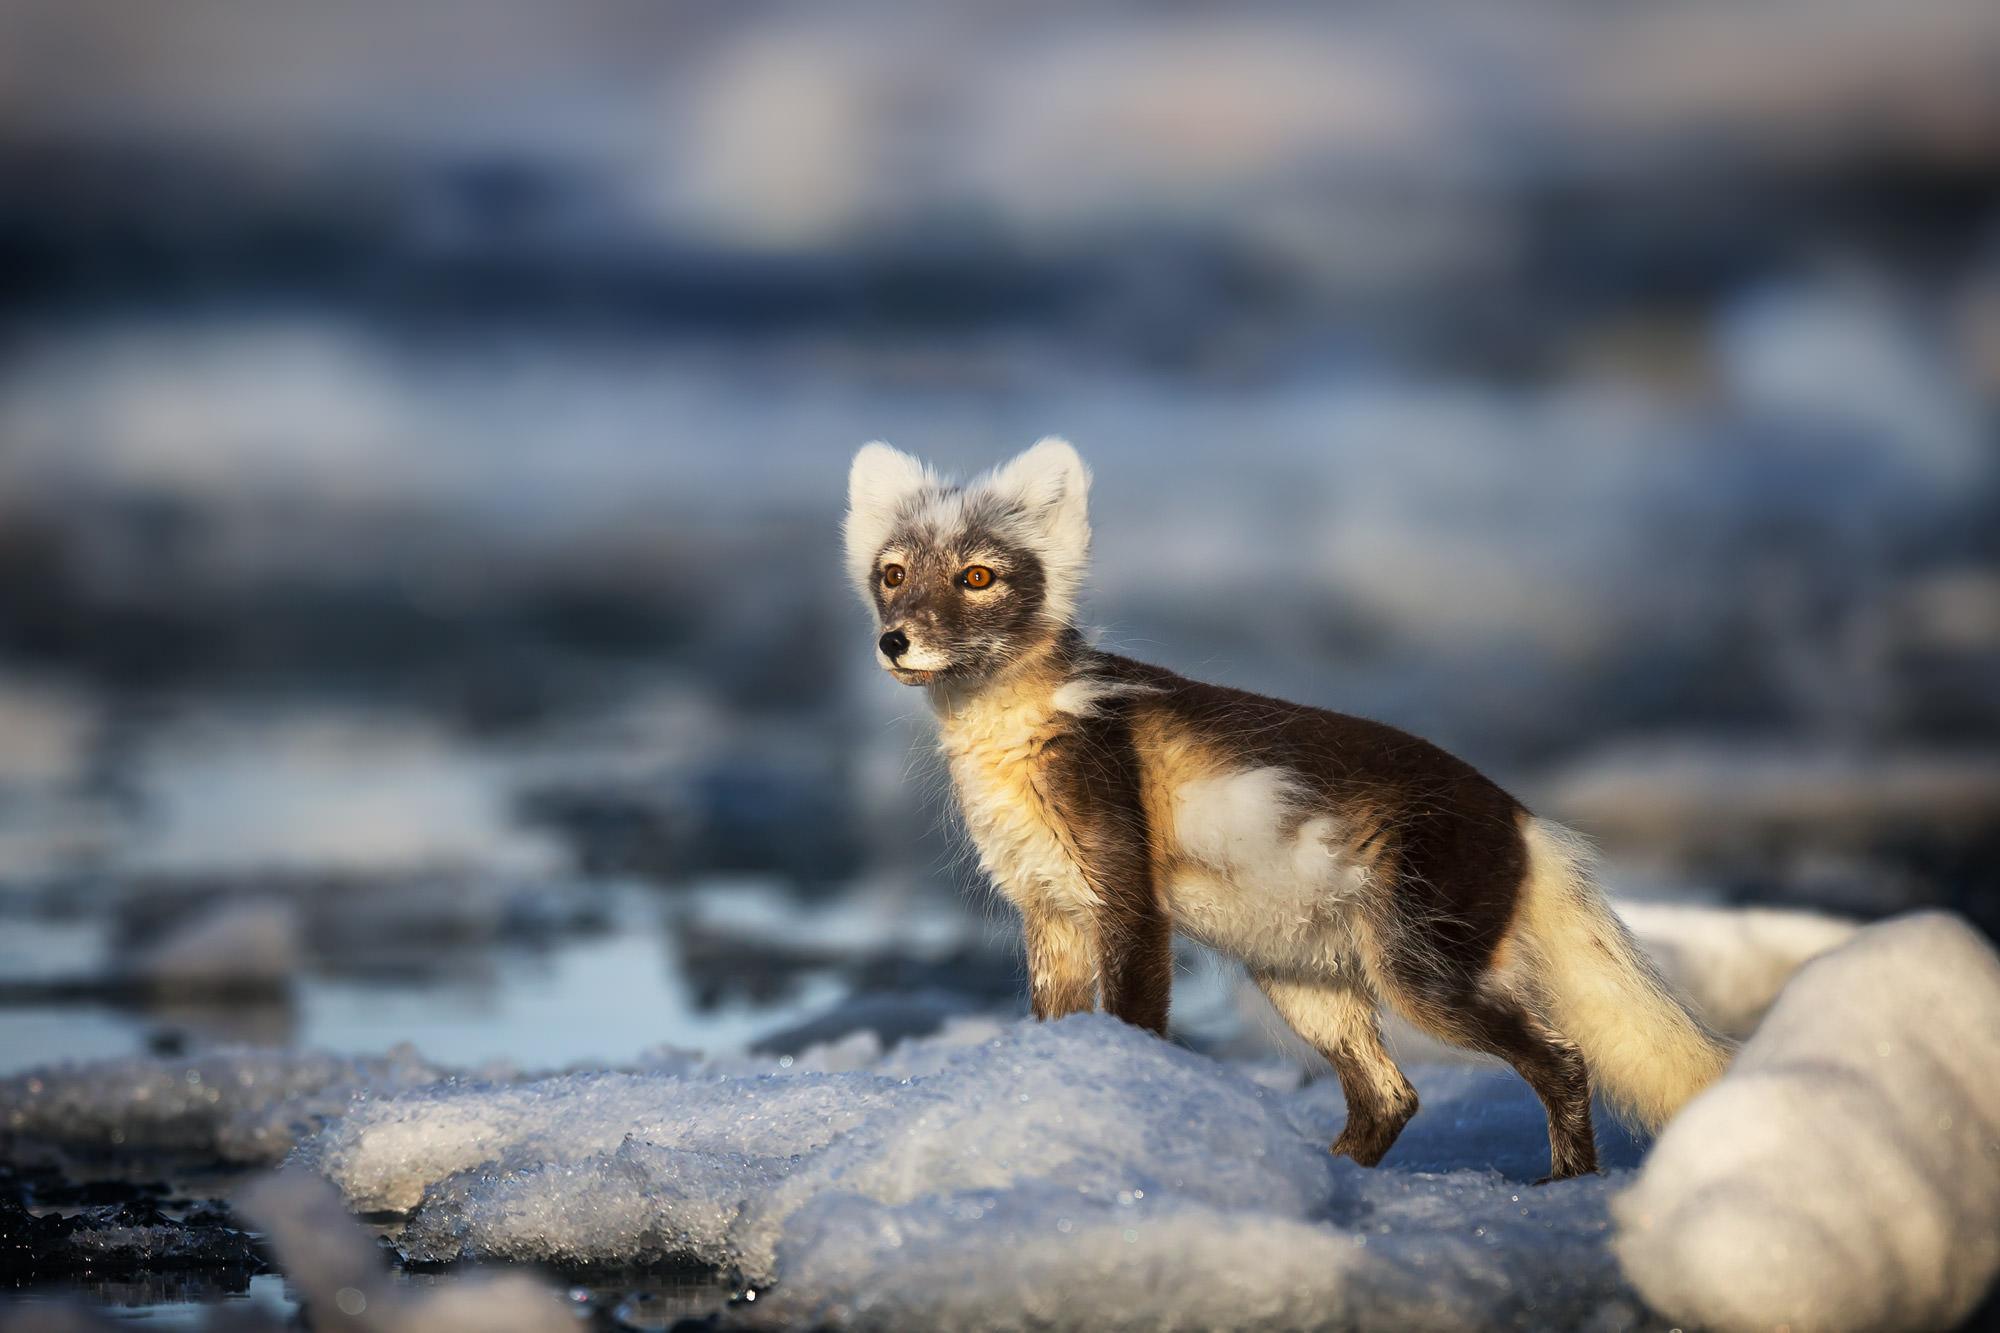 Fox, Arctic Fox, Norway, limited edition, photograph, fine art, wildlife, photo